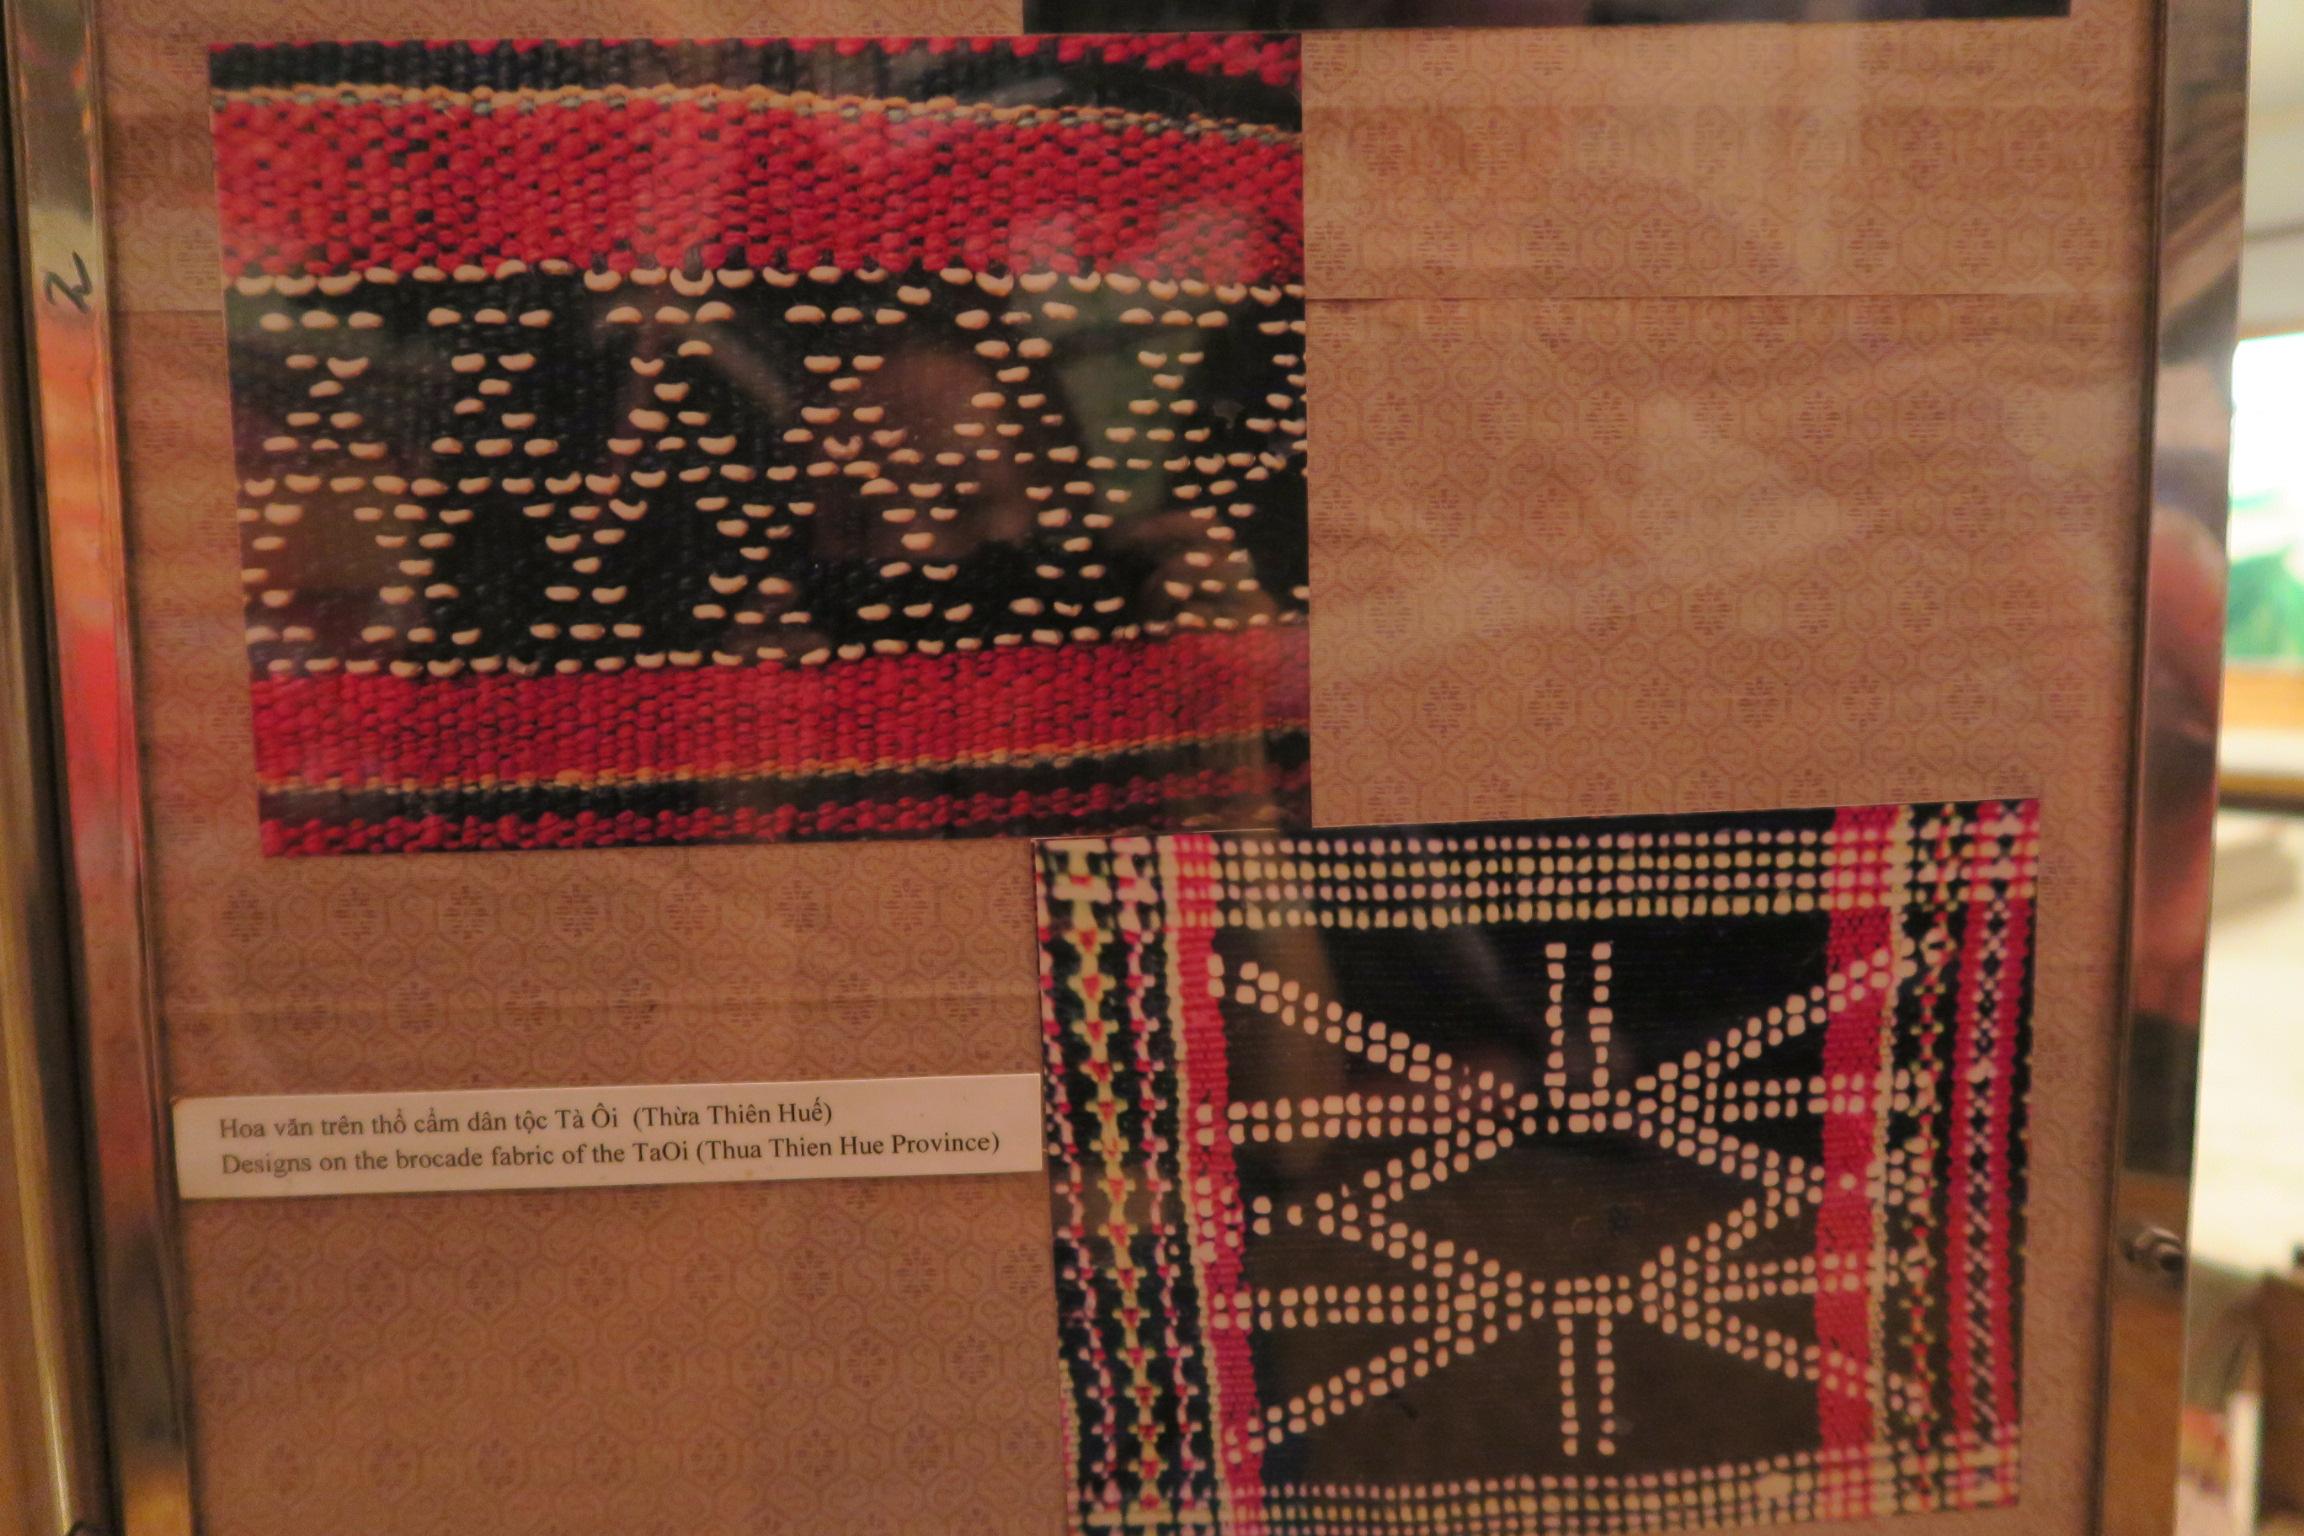 Brocade fabric details